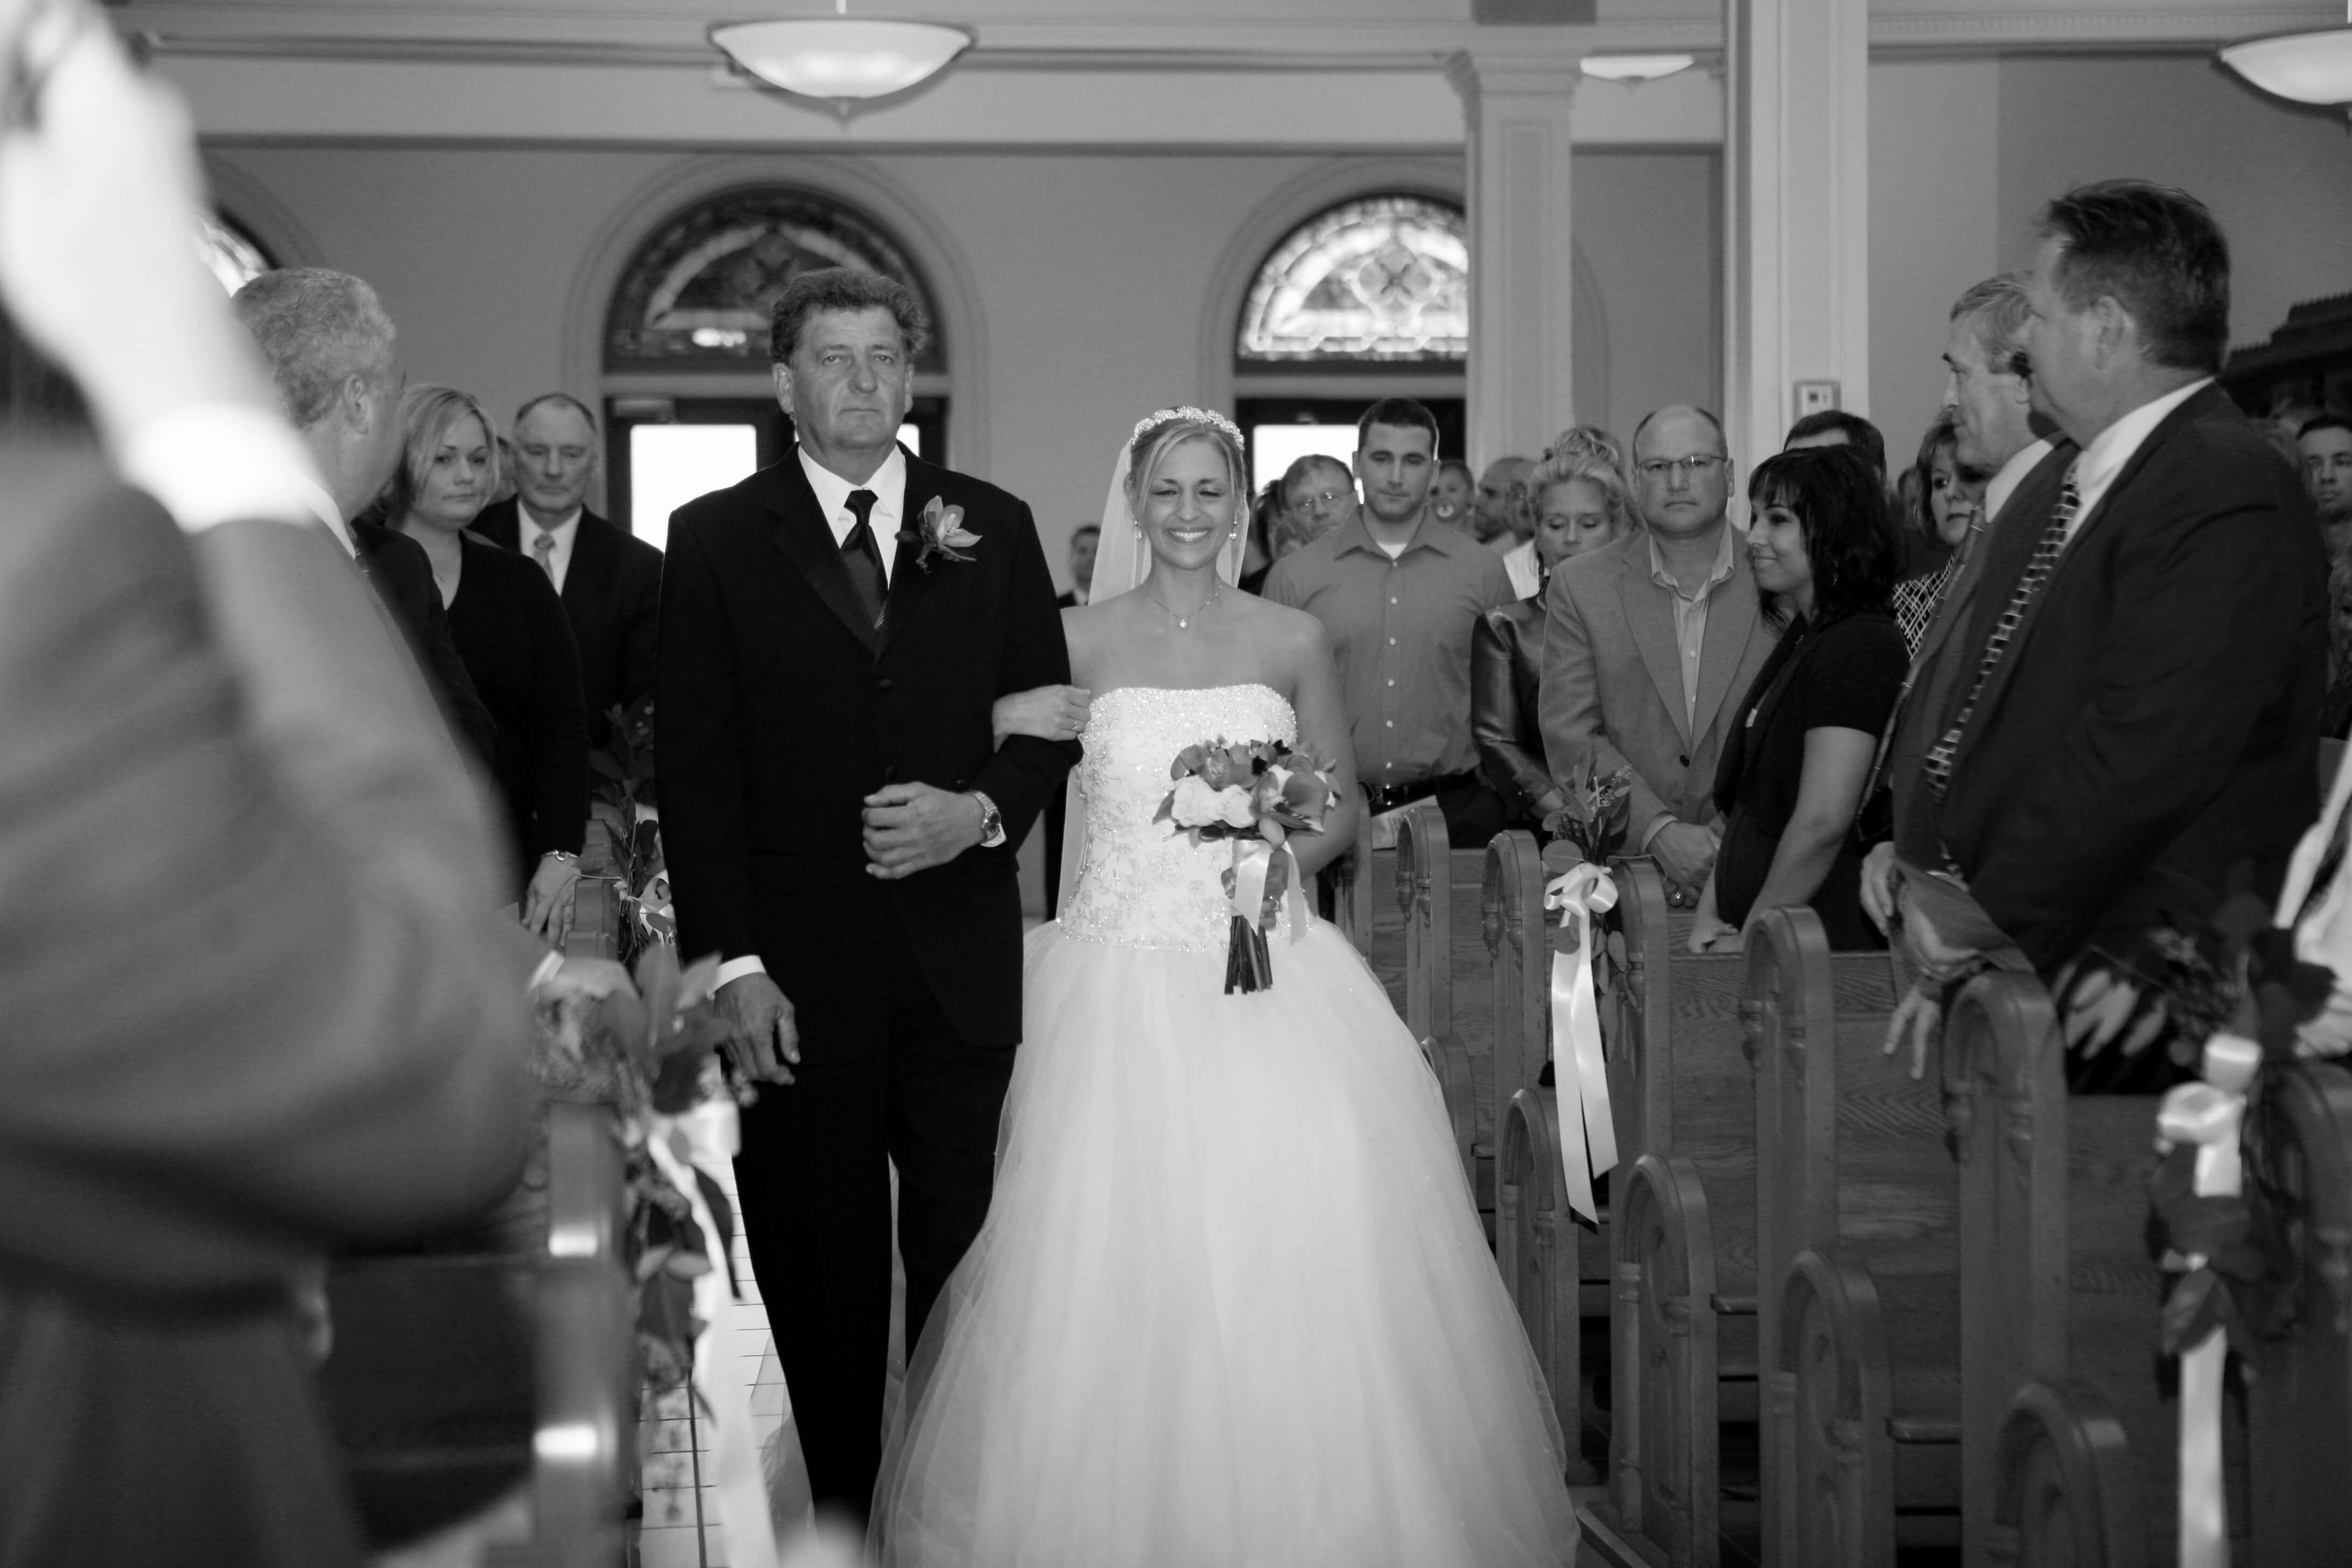 Wedding Aisle with Dad colon cancer stage 4 agutsygirl.com